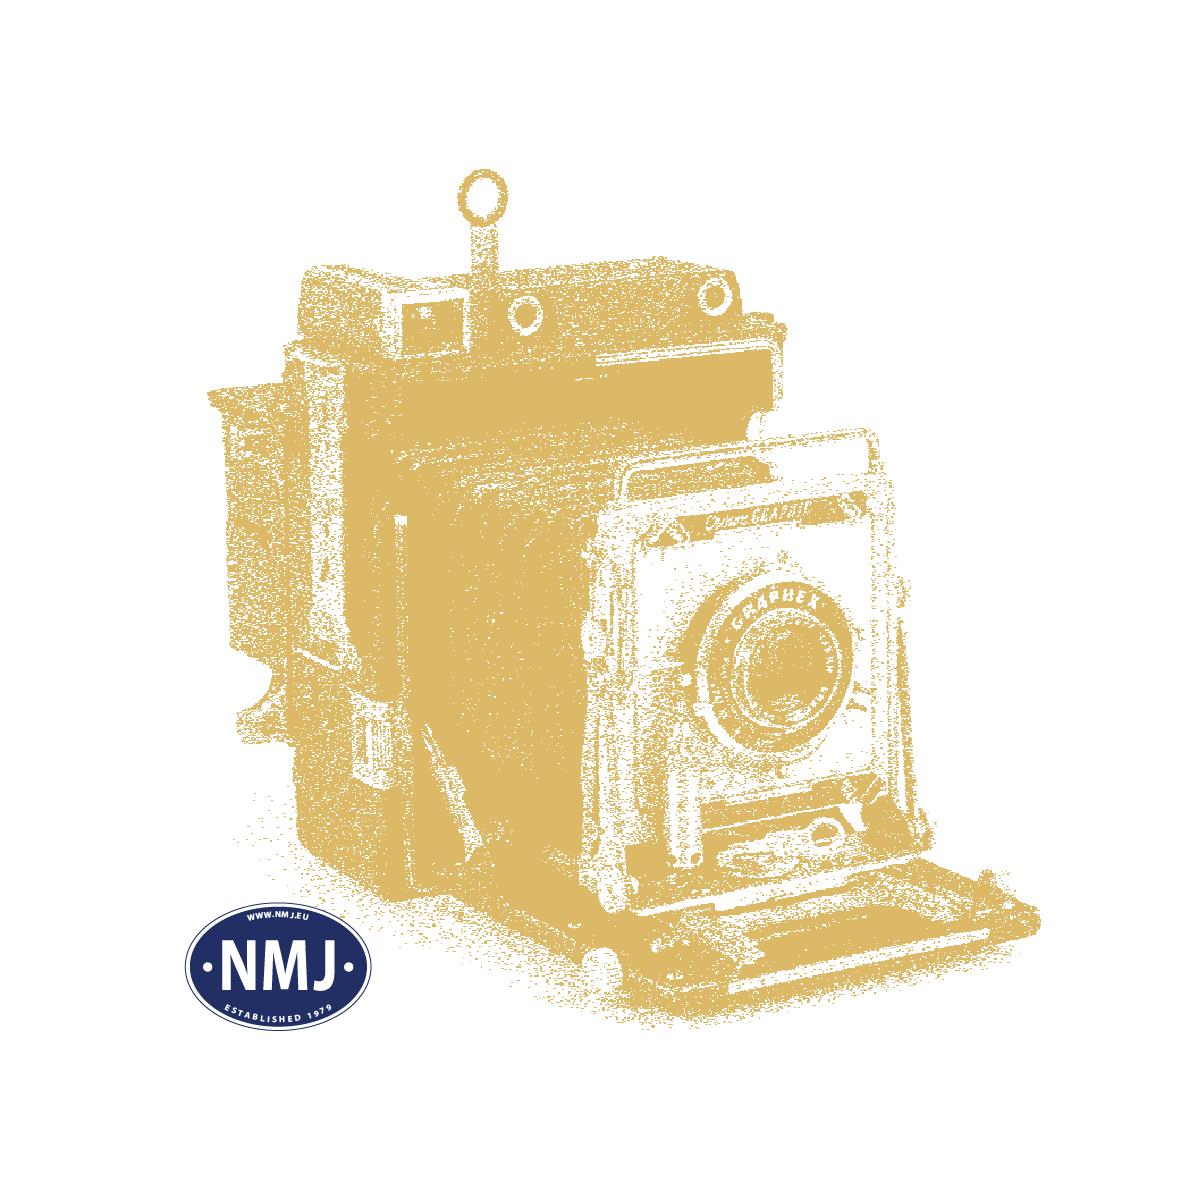 NMJT105.302 - NMJ Topline NSB A2 24005 New design